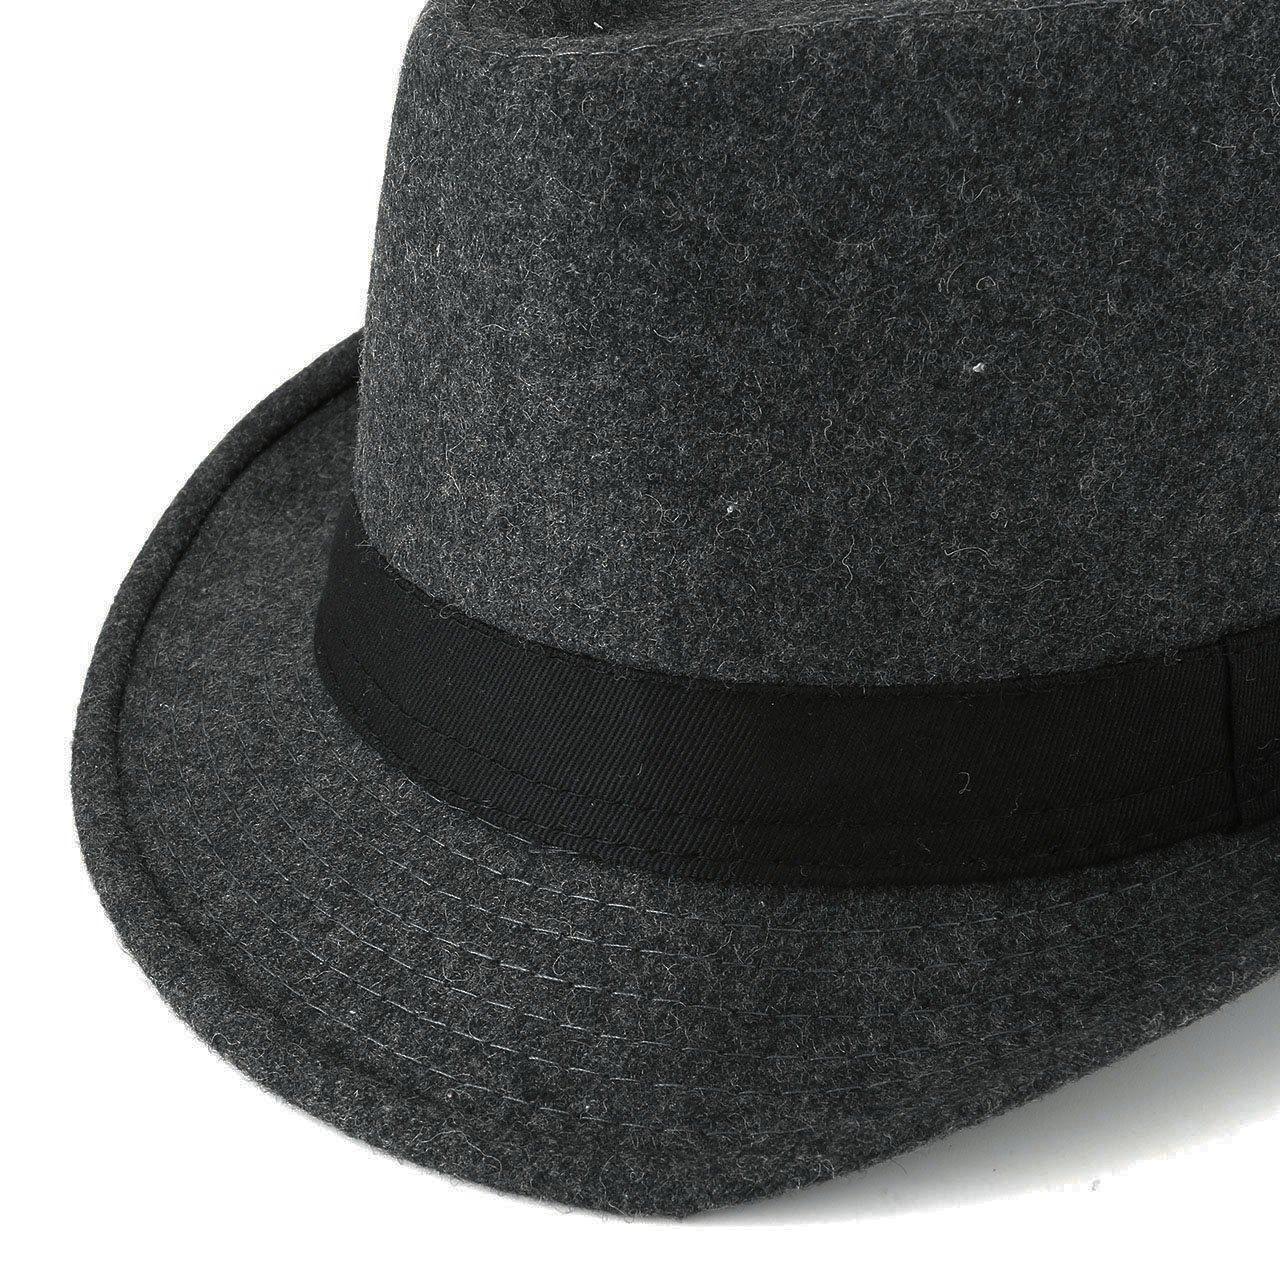 Unisex Classic Manhattan Fedora Hat Black Band Fashion Casual Jazz Wool Cap (Grey) by Faleto (Image #5)